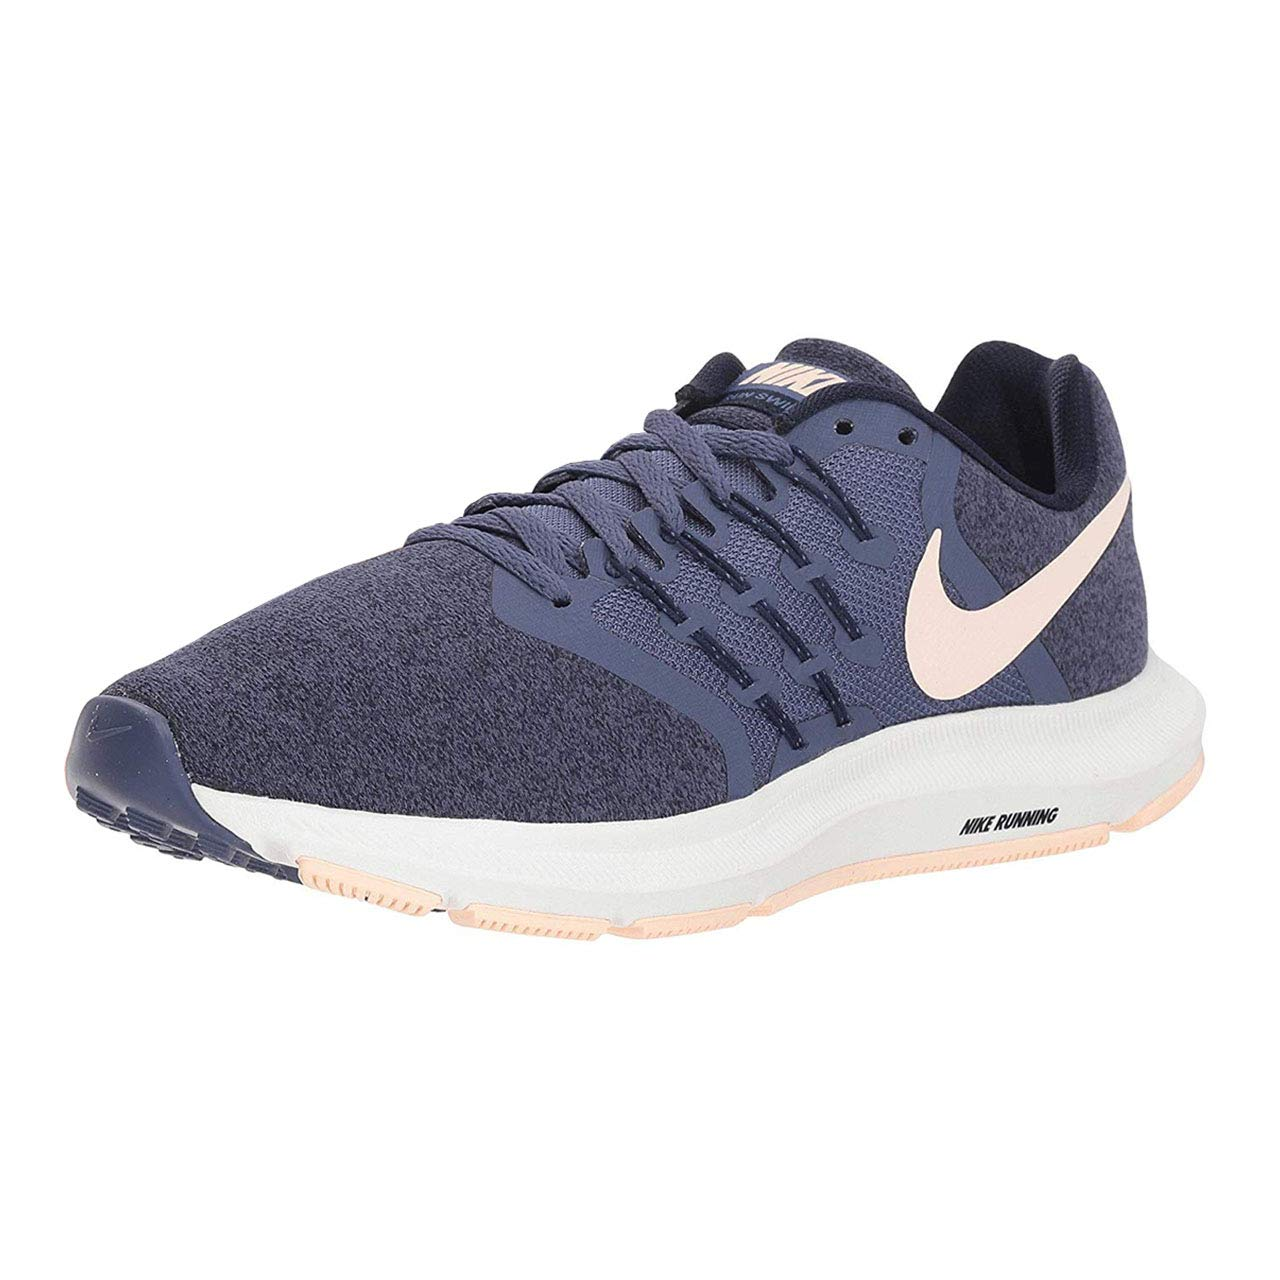 Nike WMNS Run Swift damen damen damen 909006-501 Größe 6.5 2af111